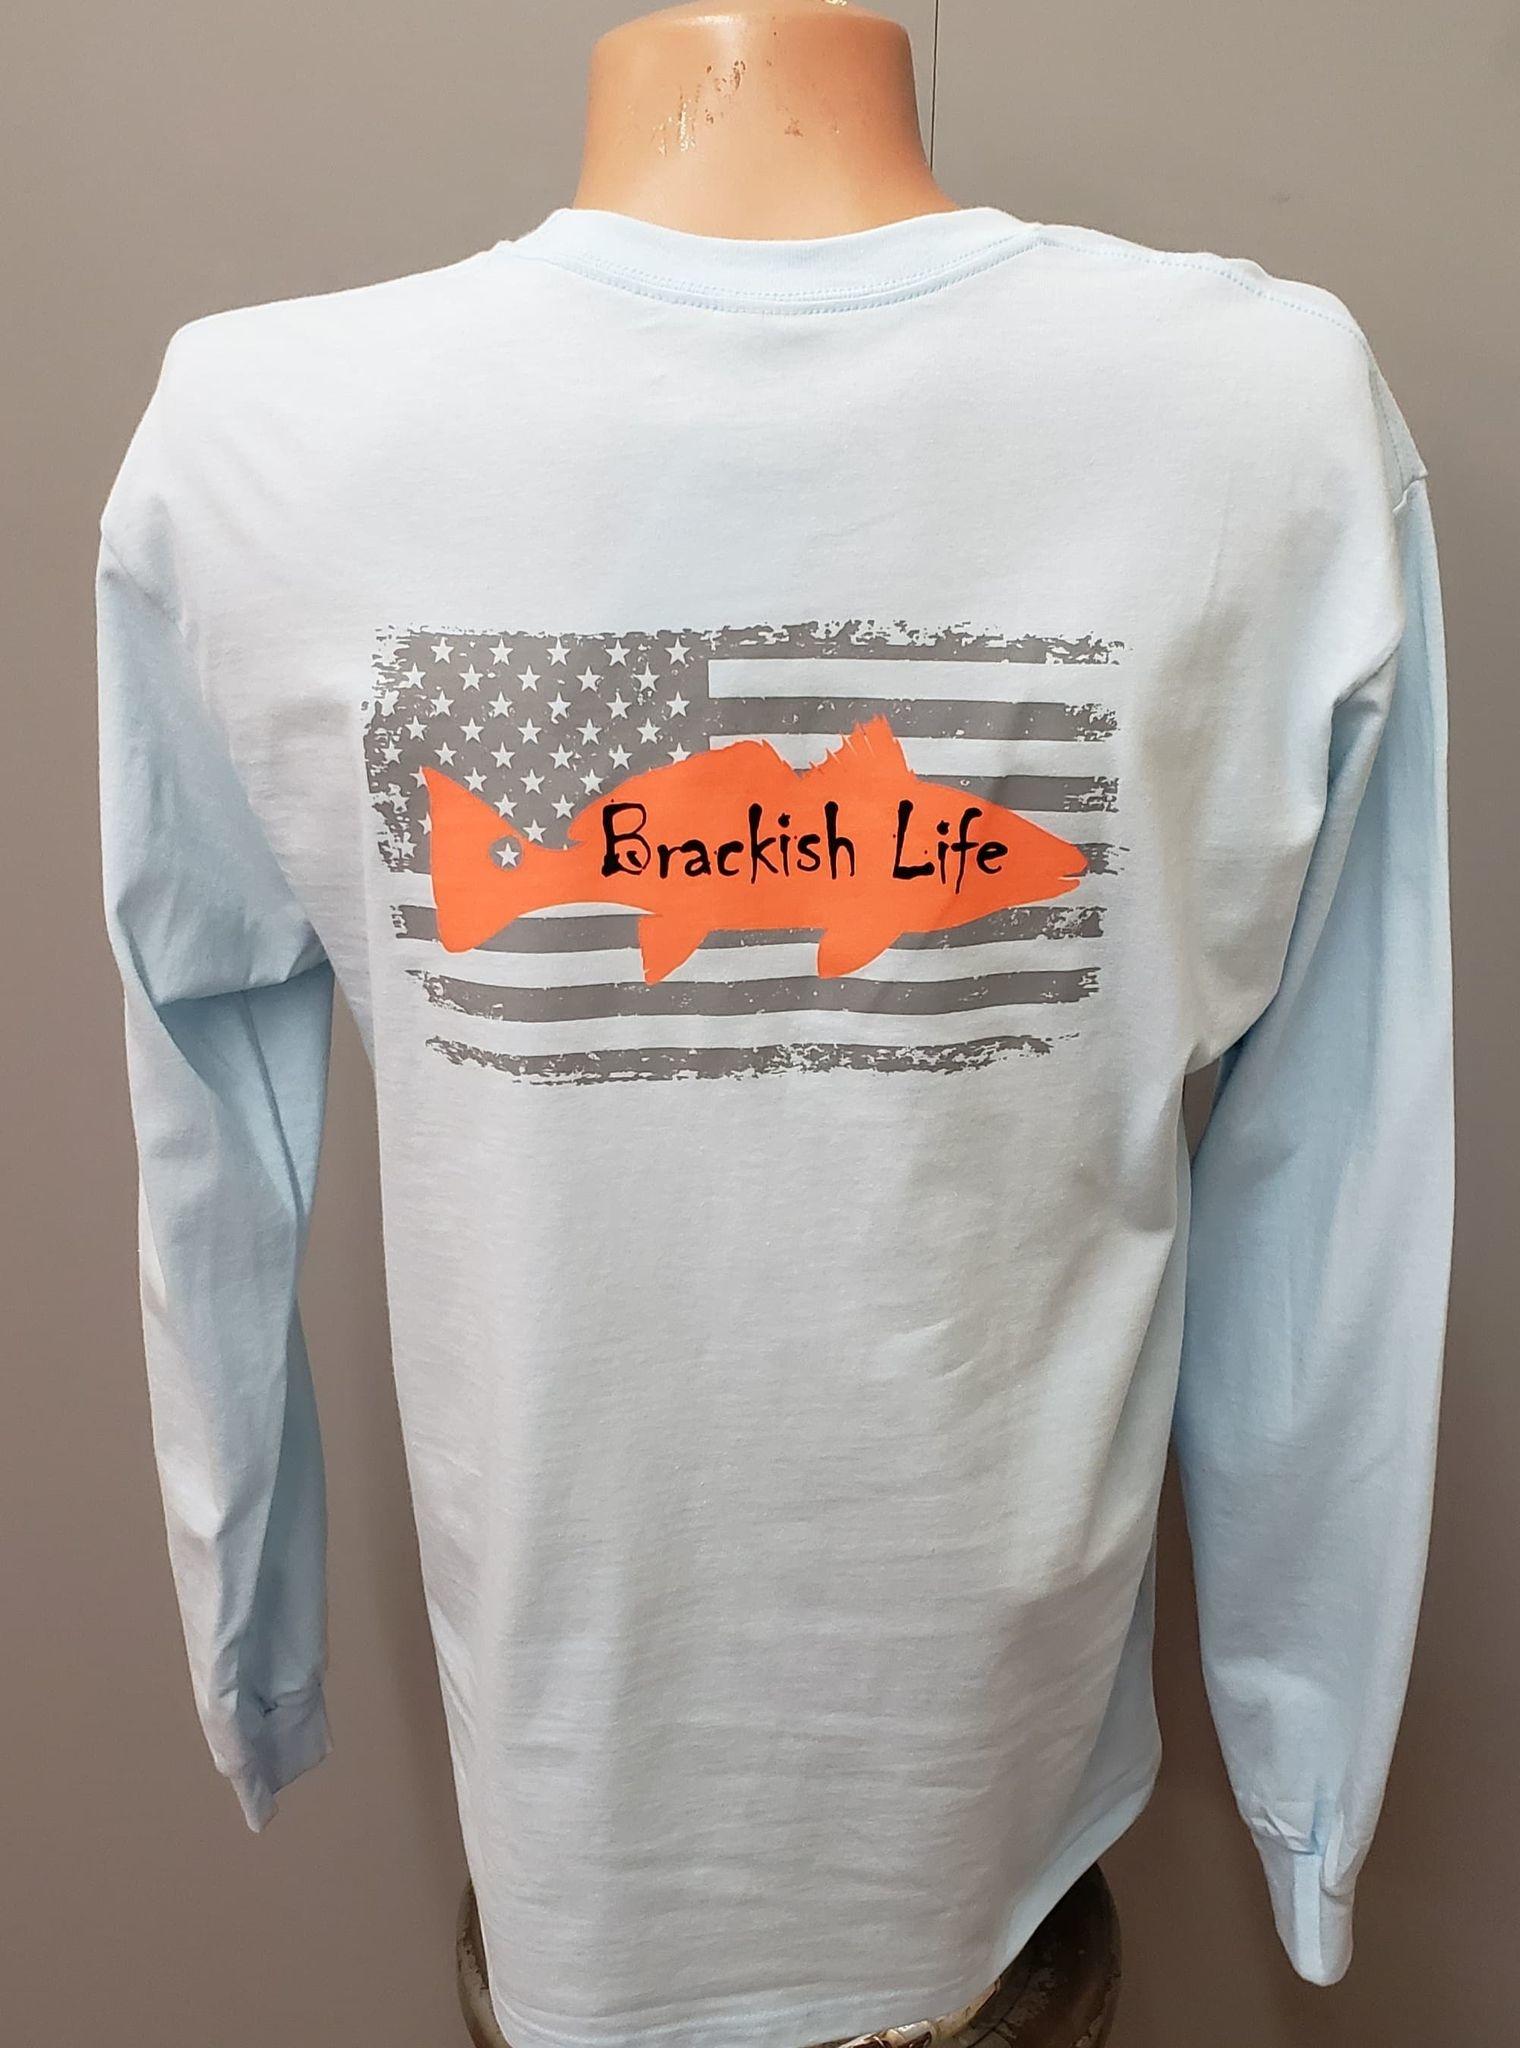 Brackish Life Gildan Hammer Super Soft L/S T-Shirt